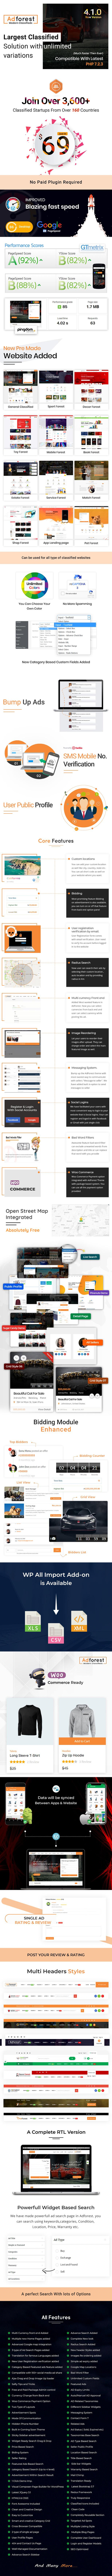 1608774252 962 07 - AdForest - Classified Ads WordPress Theme